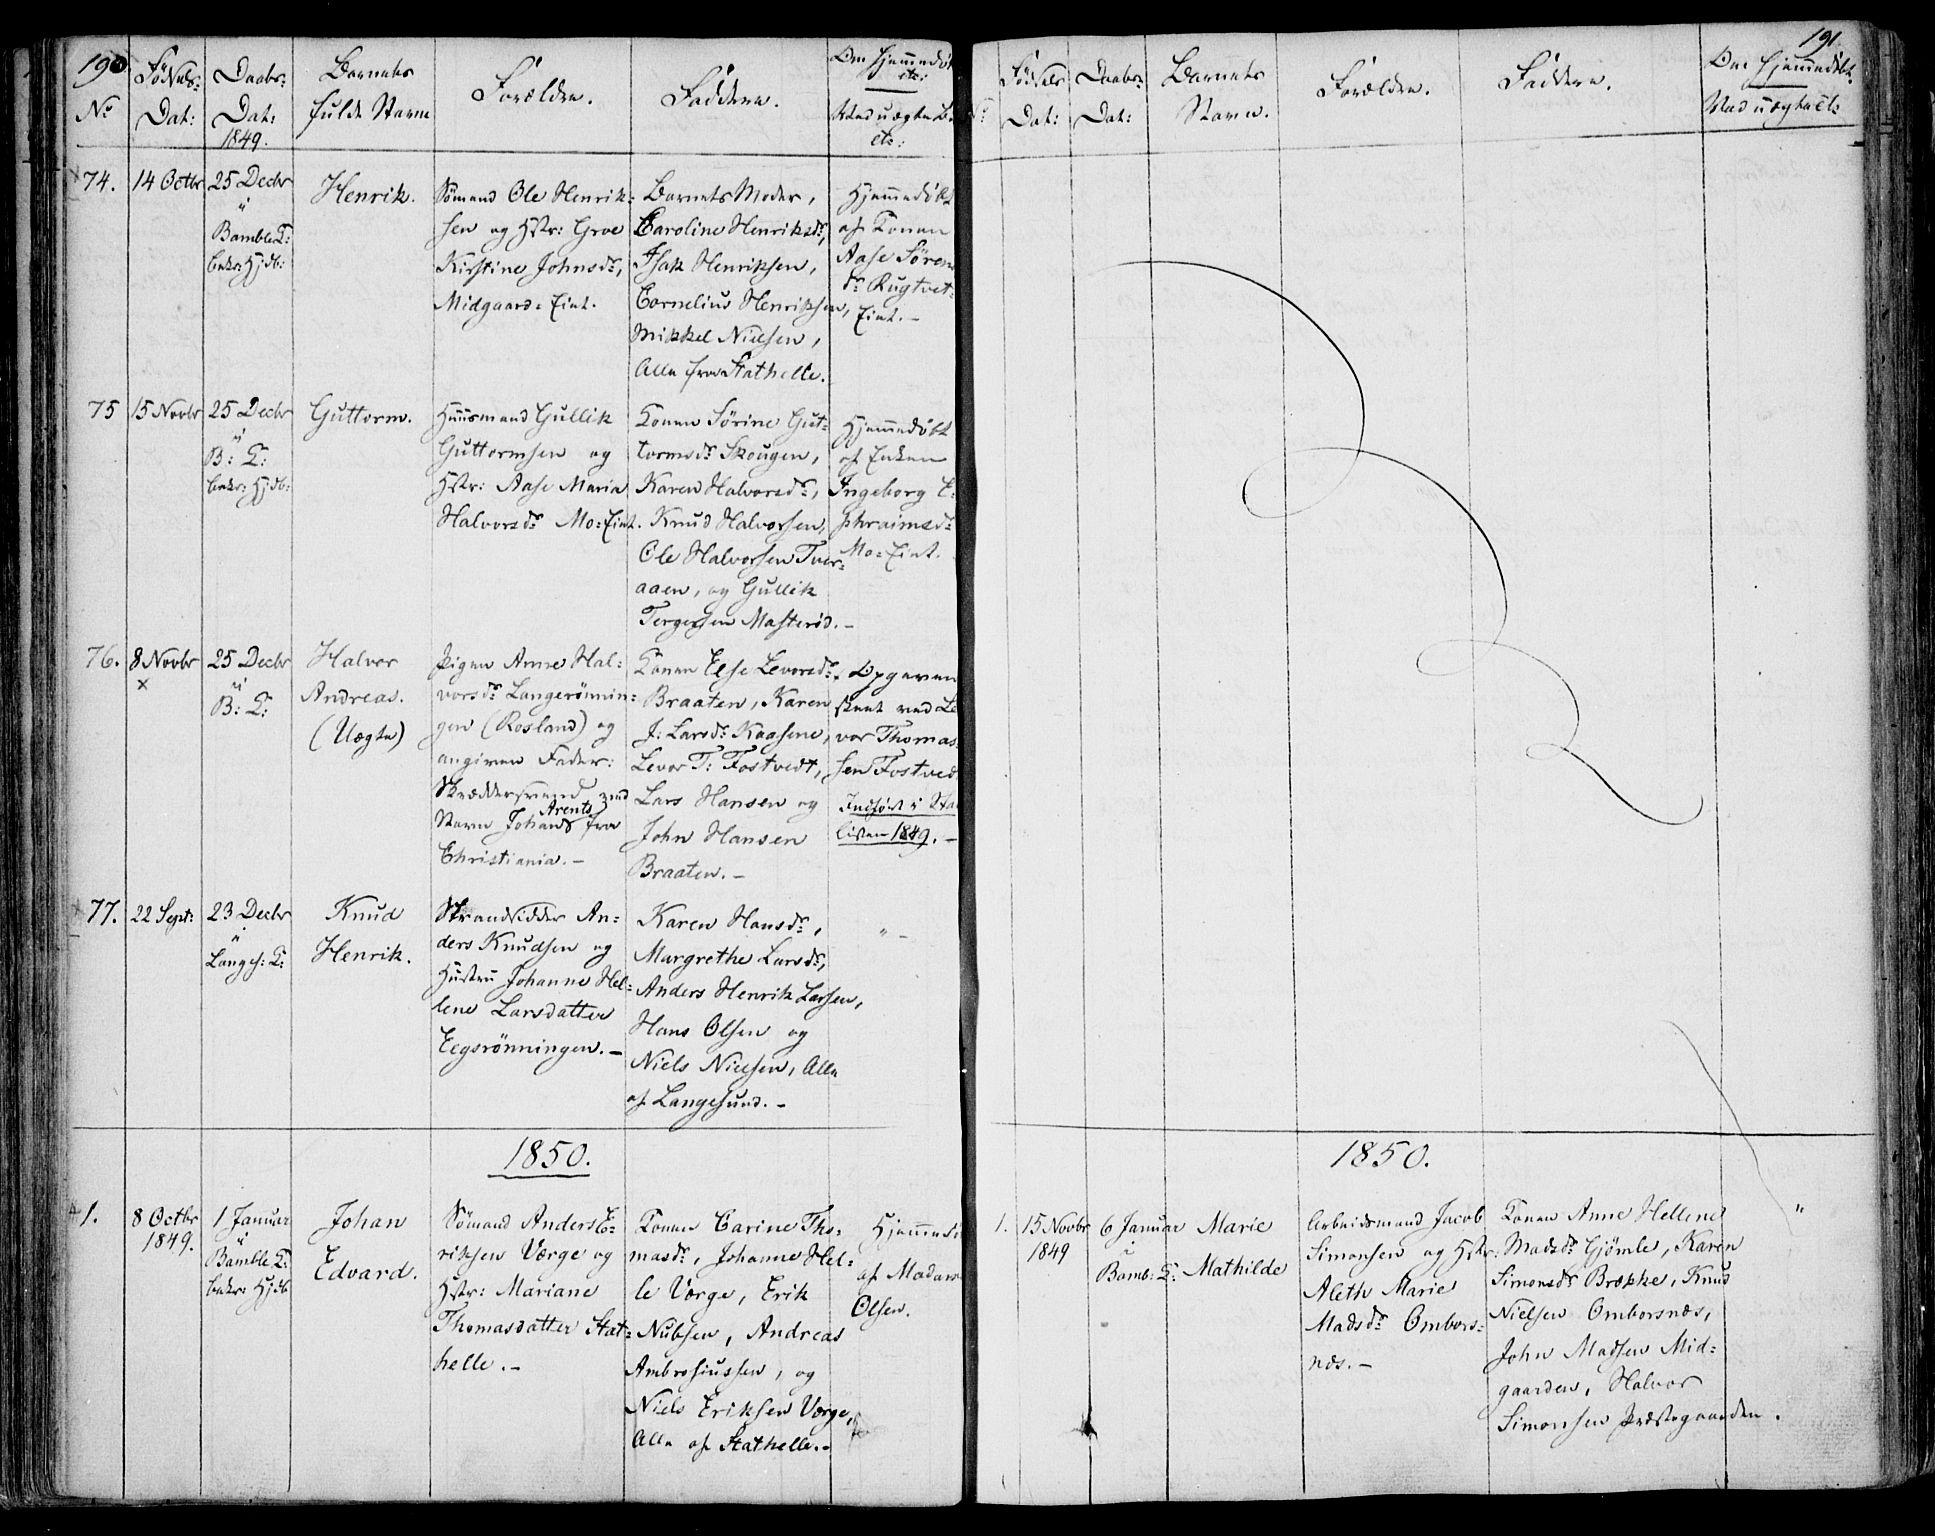 SAKO, Bamble kirkebøker, F/Fa/L0004: Ministerialbok nr. I 4, 1834-1853, s. 190-191